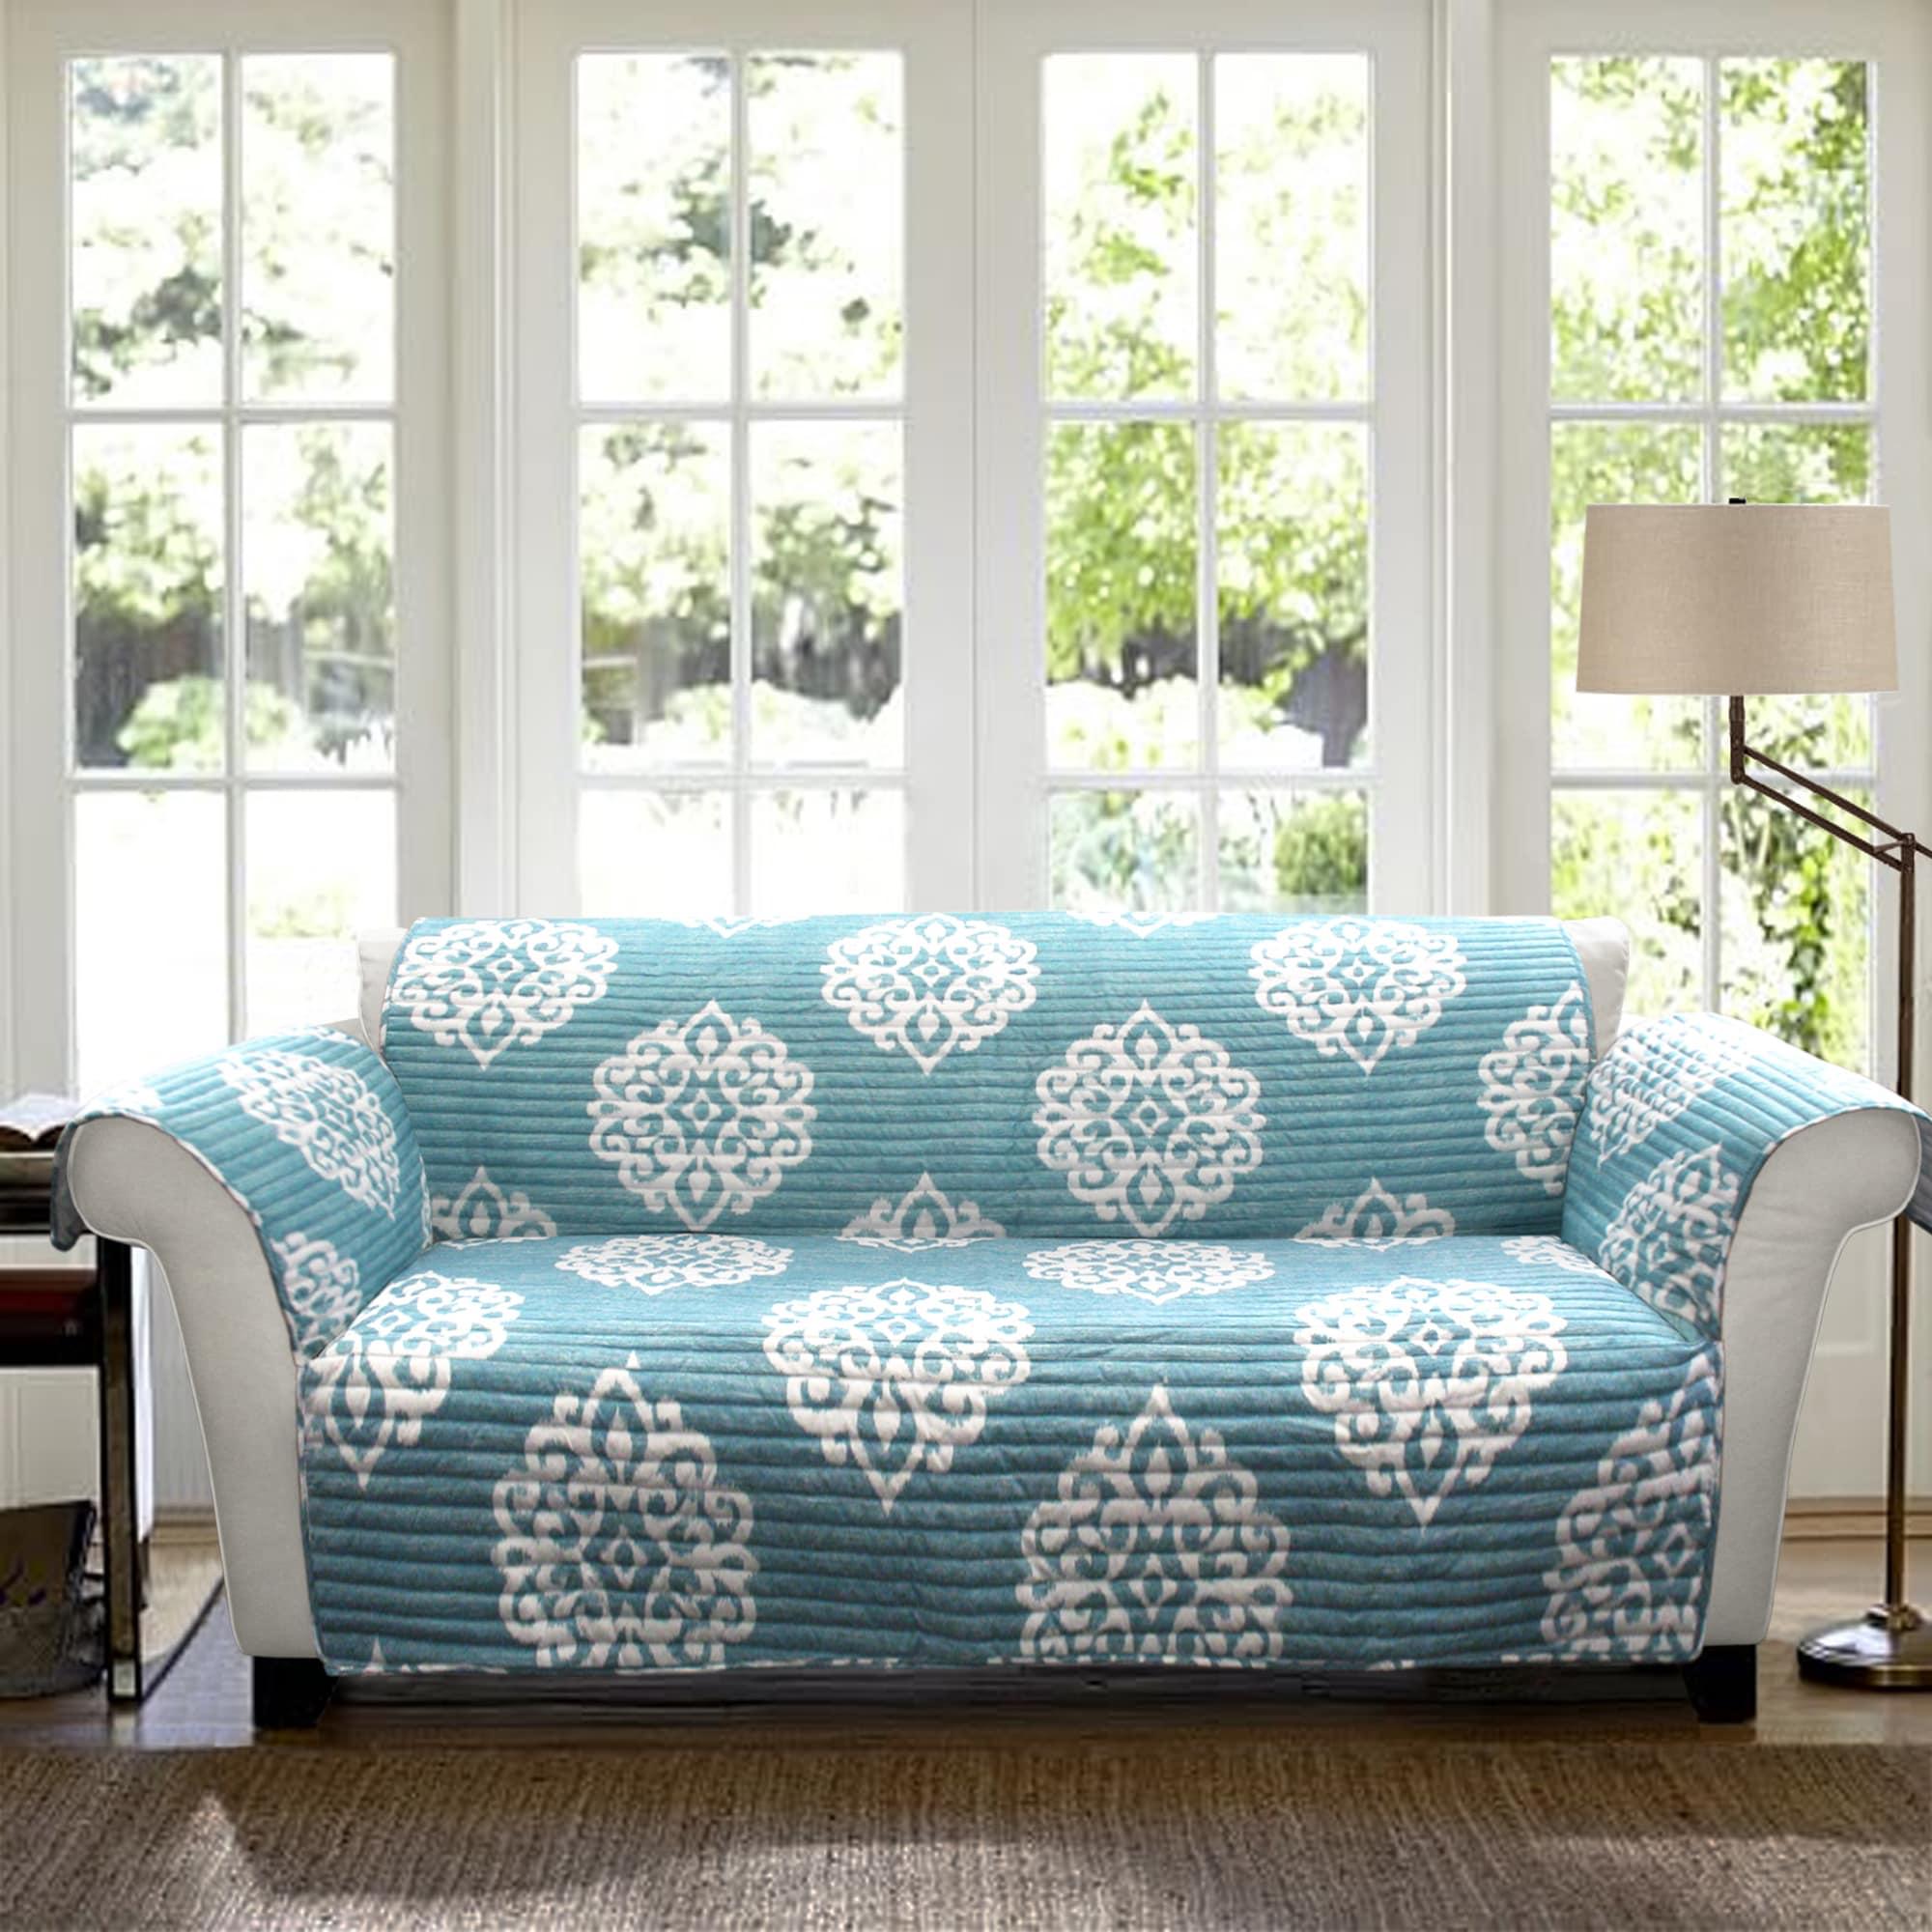 Shop Lush Decor Sophie Sofa Furniture Protector Free Shipping